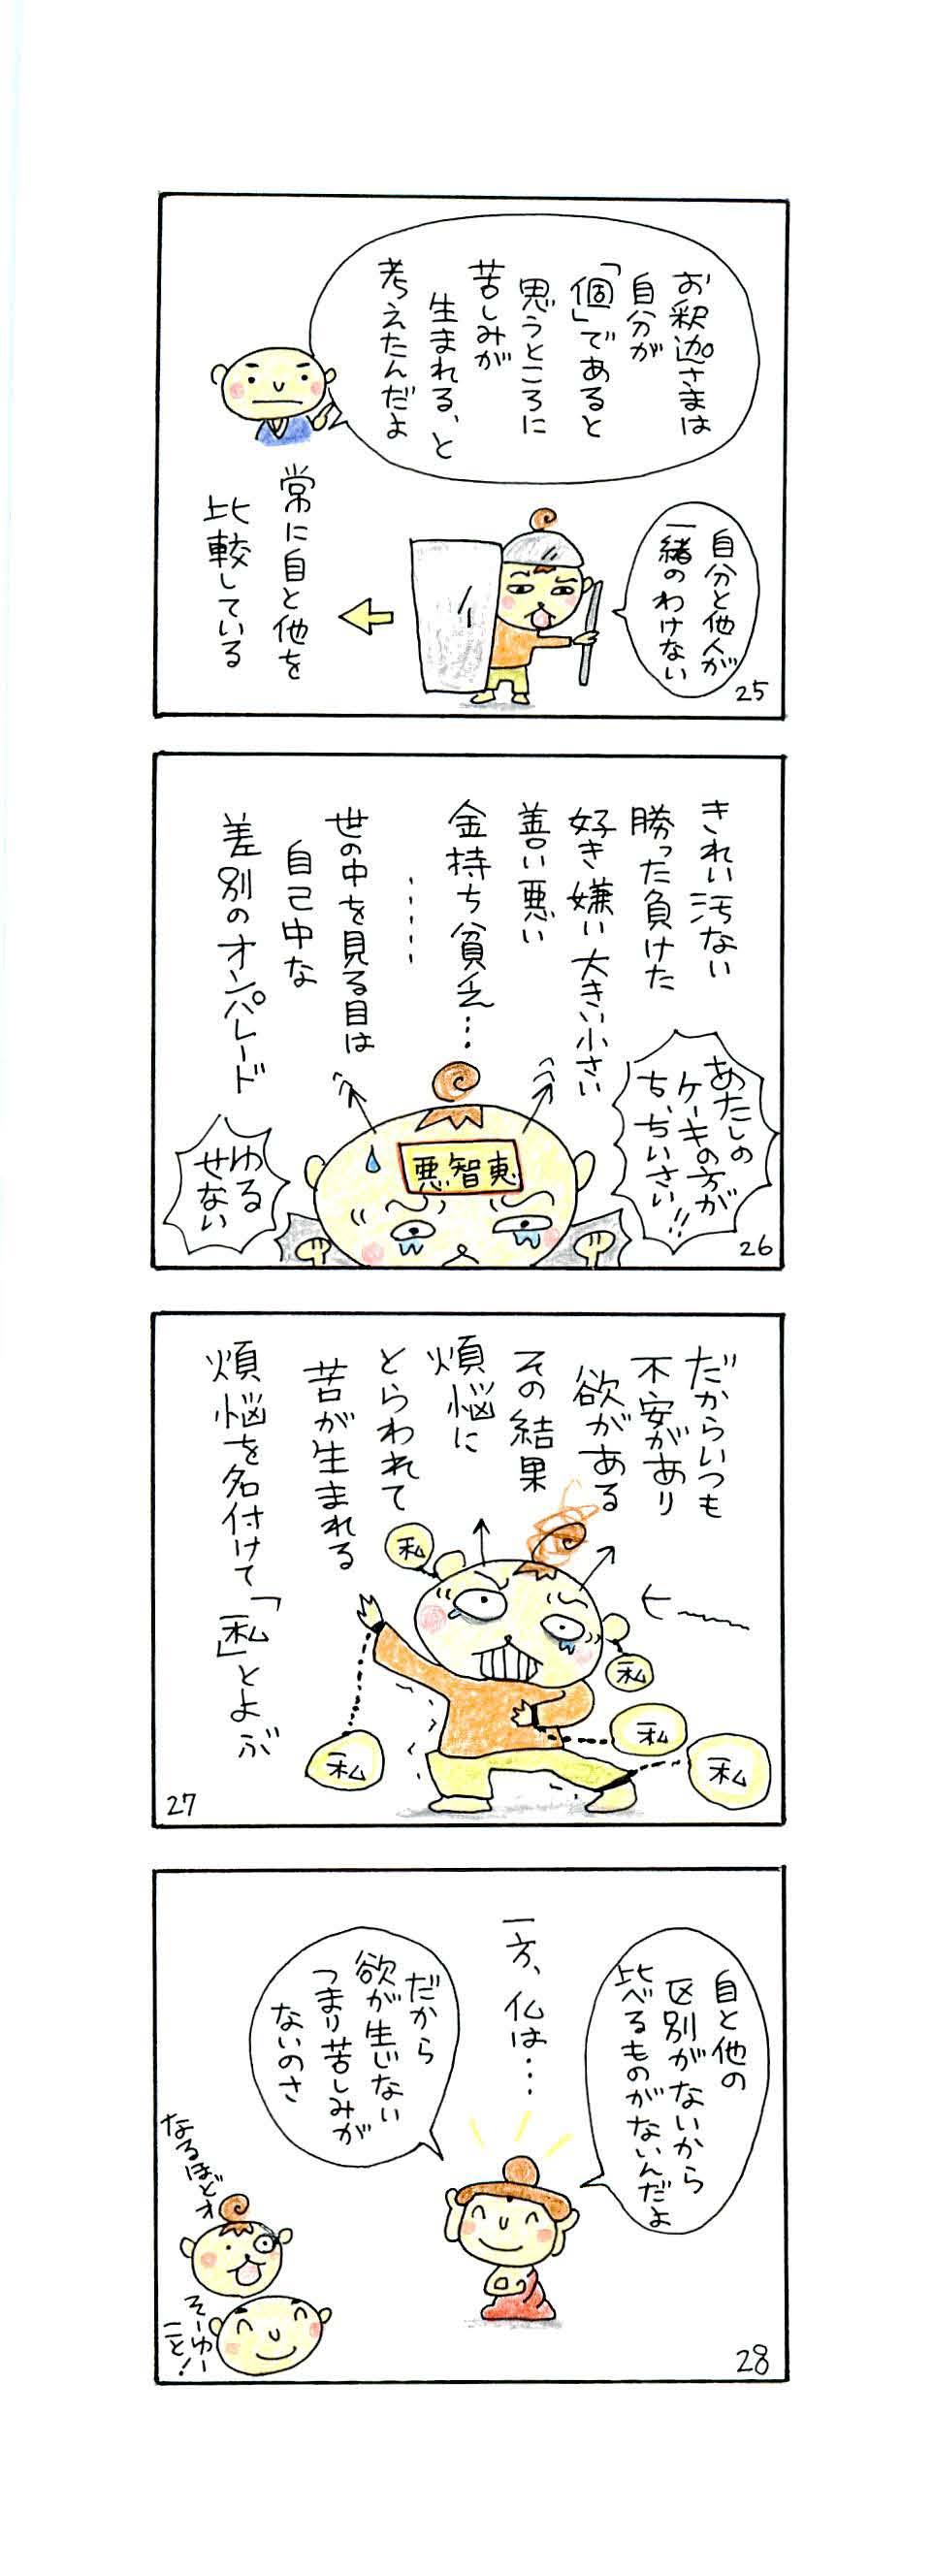 般若心経「五蘊と空」p25-p28